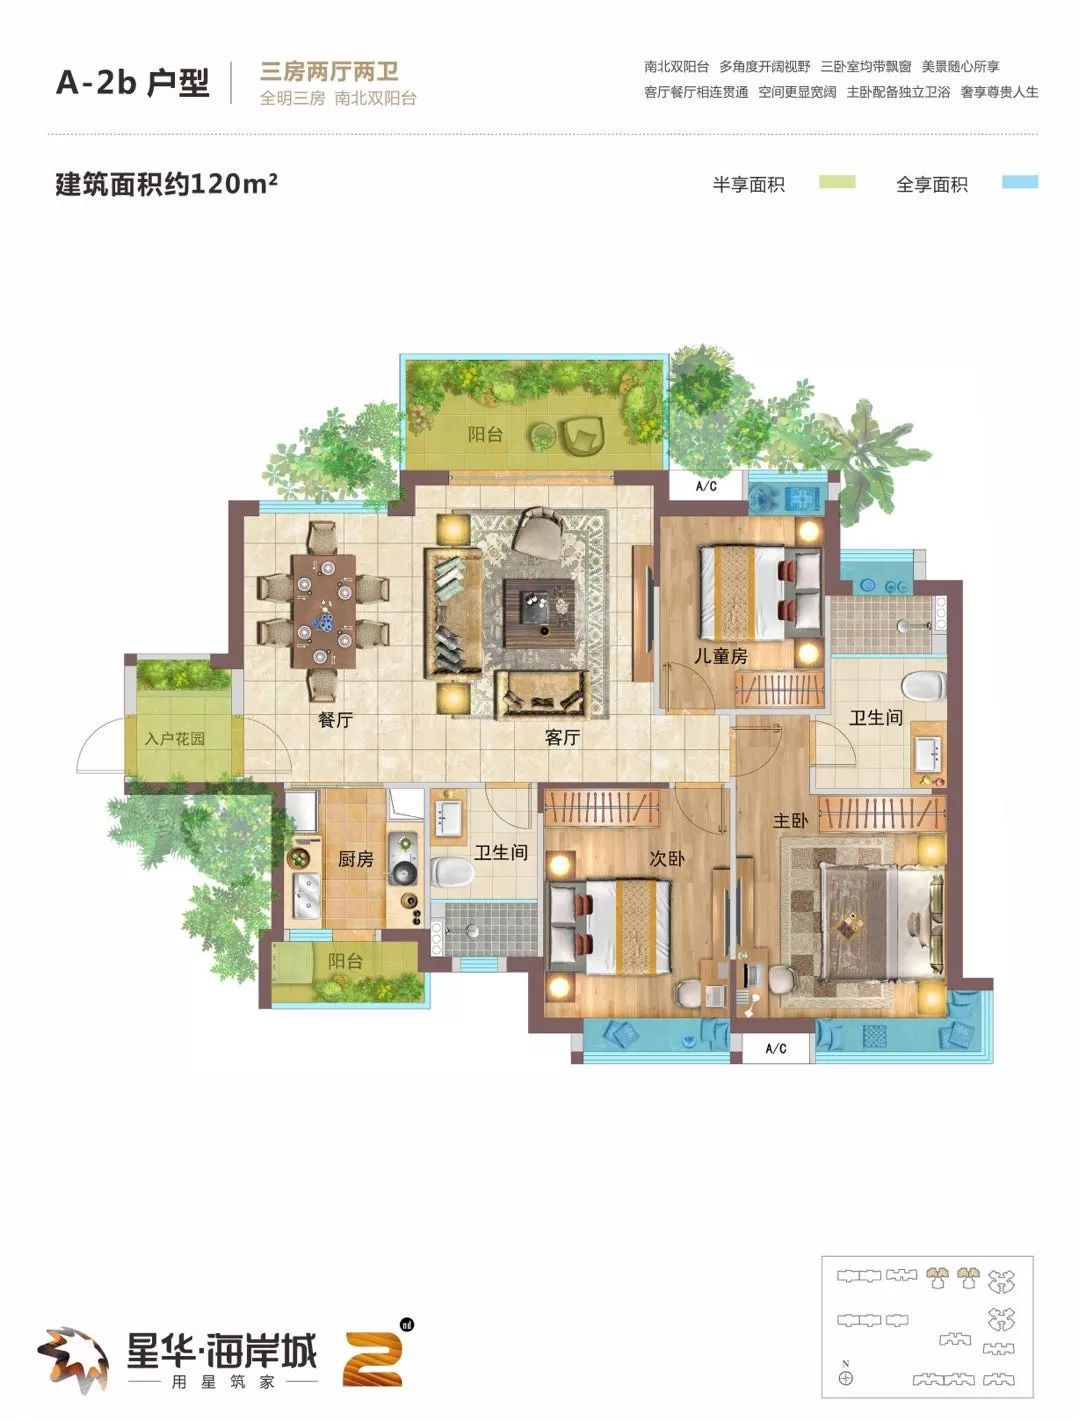 A-2b户型  3室2厅2卫1厨 建筑面积:120.00㎡